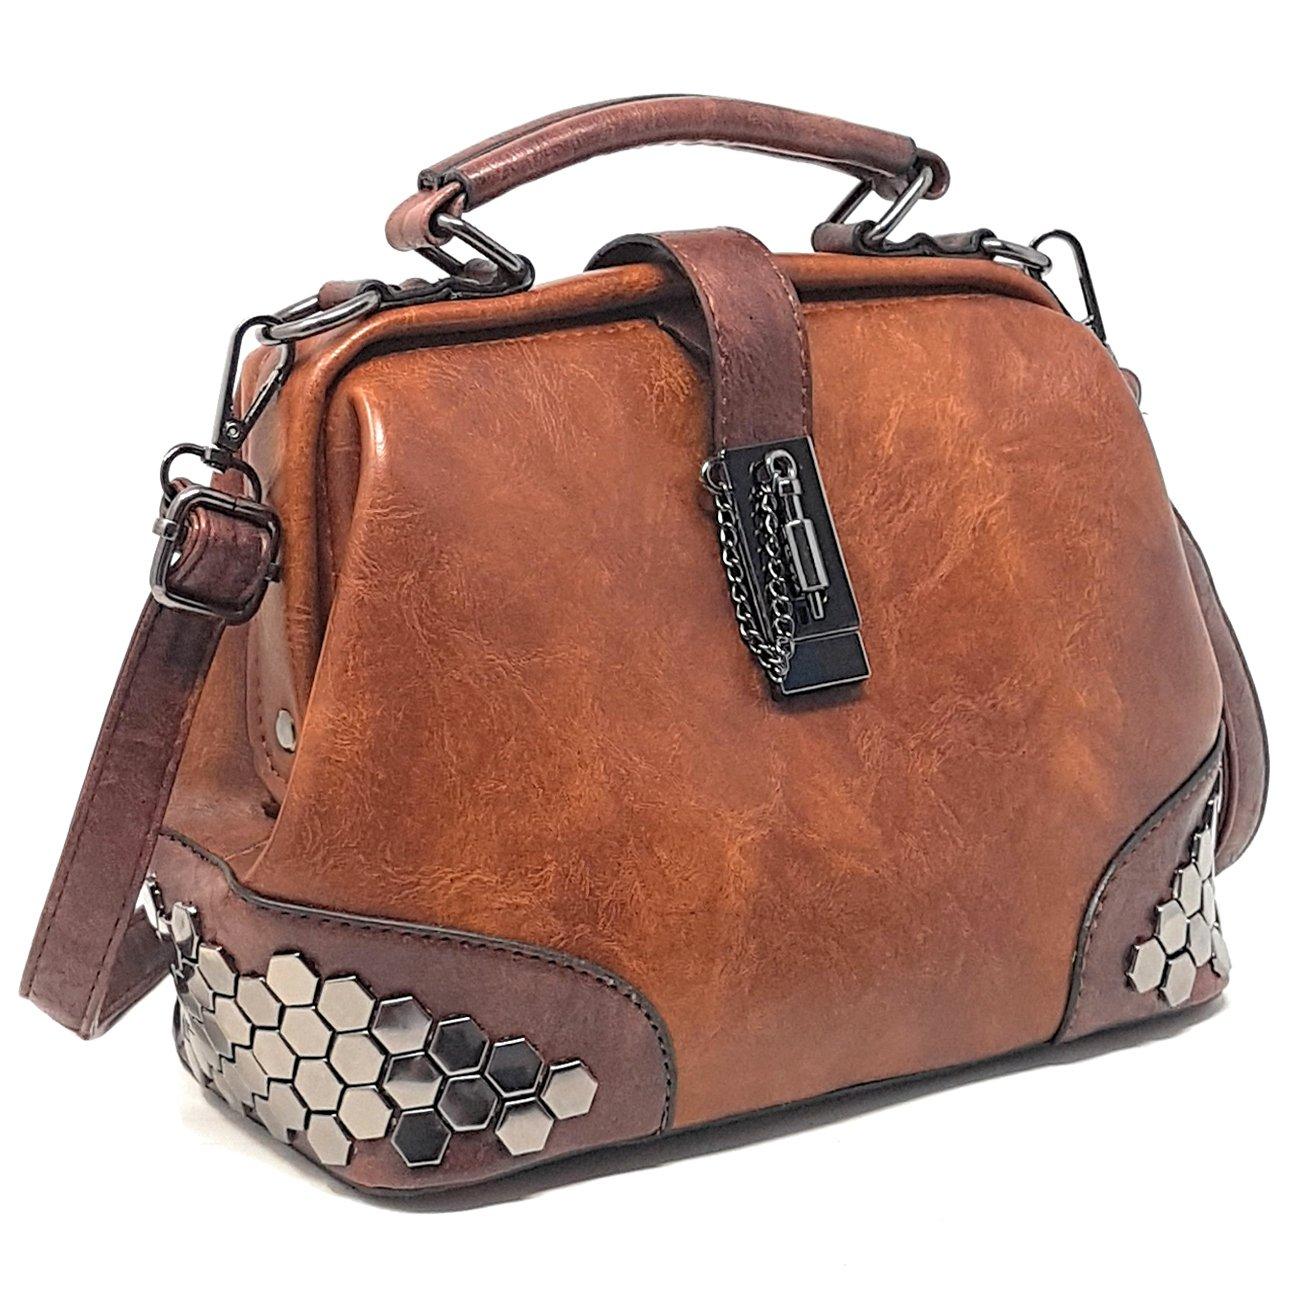 Vegan Leather Women's Handbag and Purse - Ladies' Doctor Bag w/Top Handle - Tote